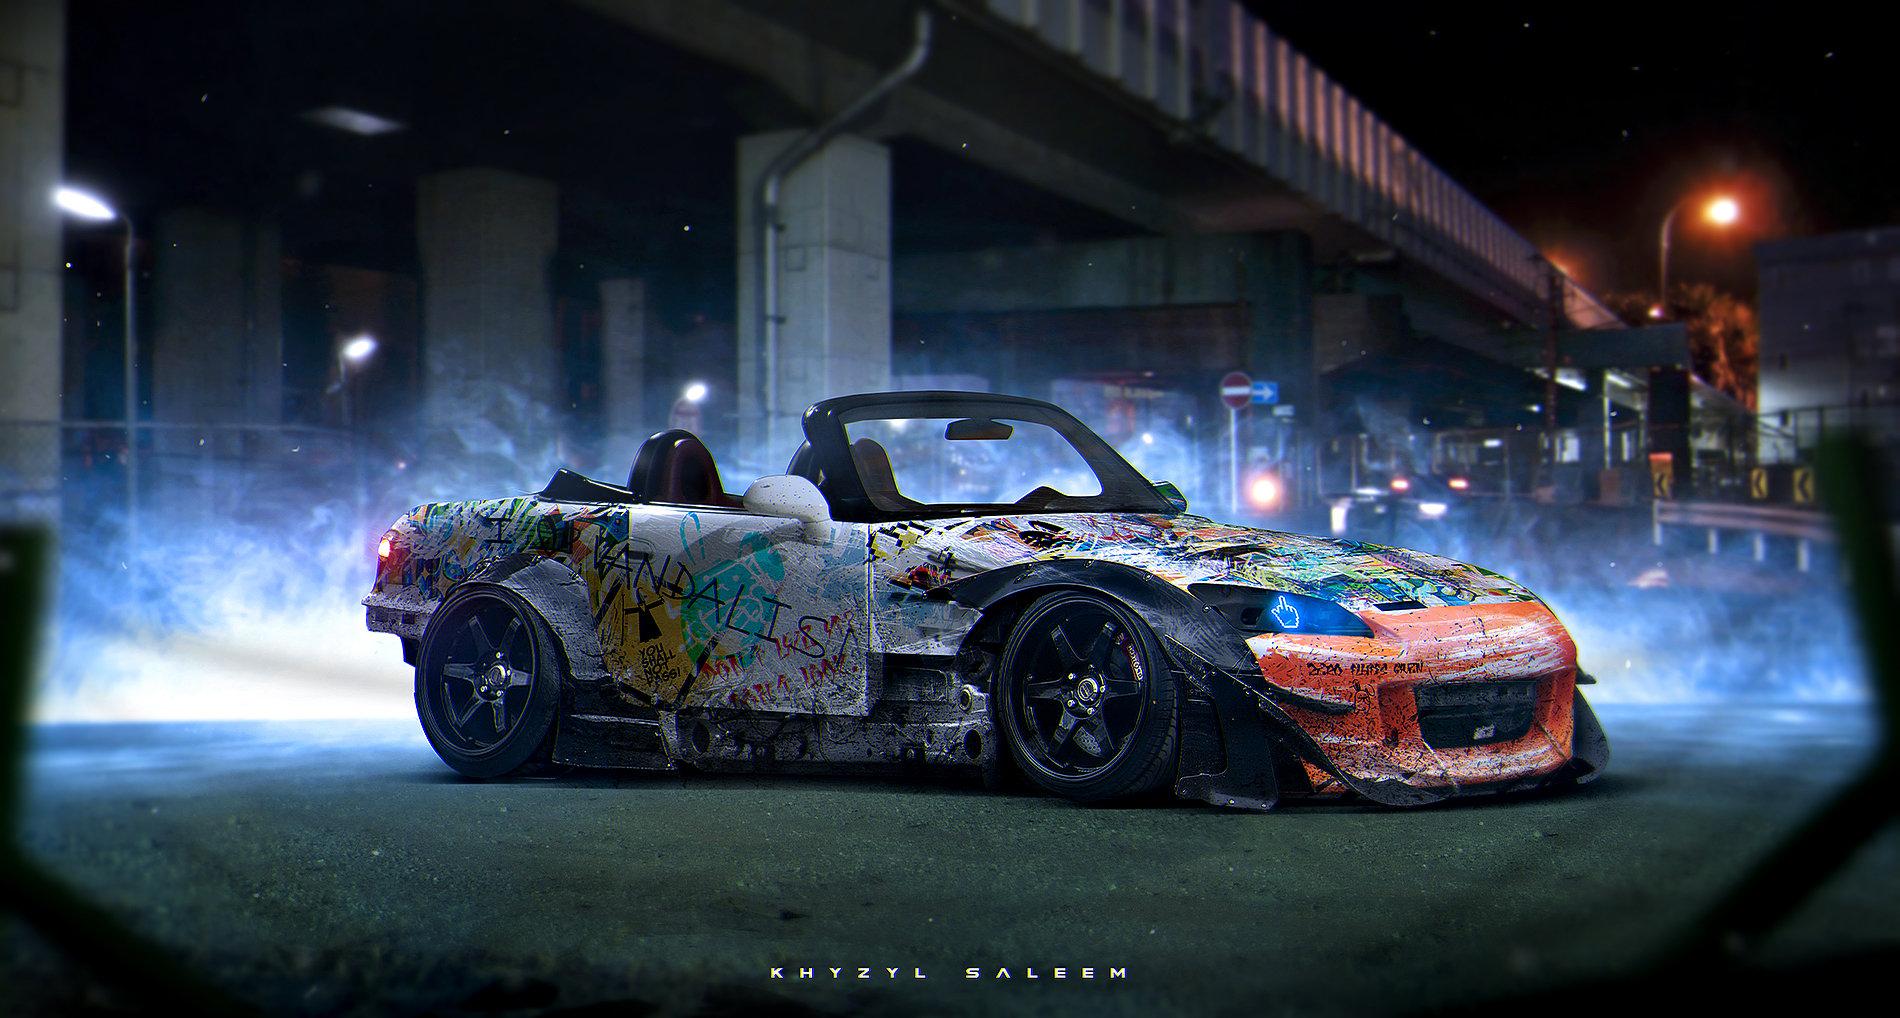 Insane cars designs by Khyzyl Saleem | Art-Spire